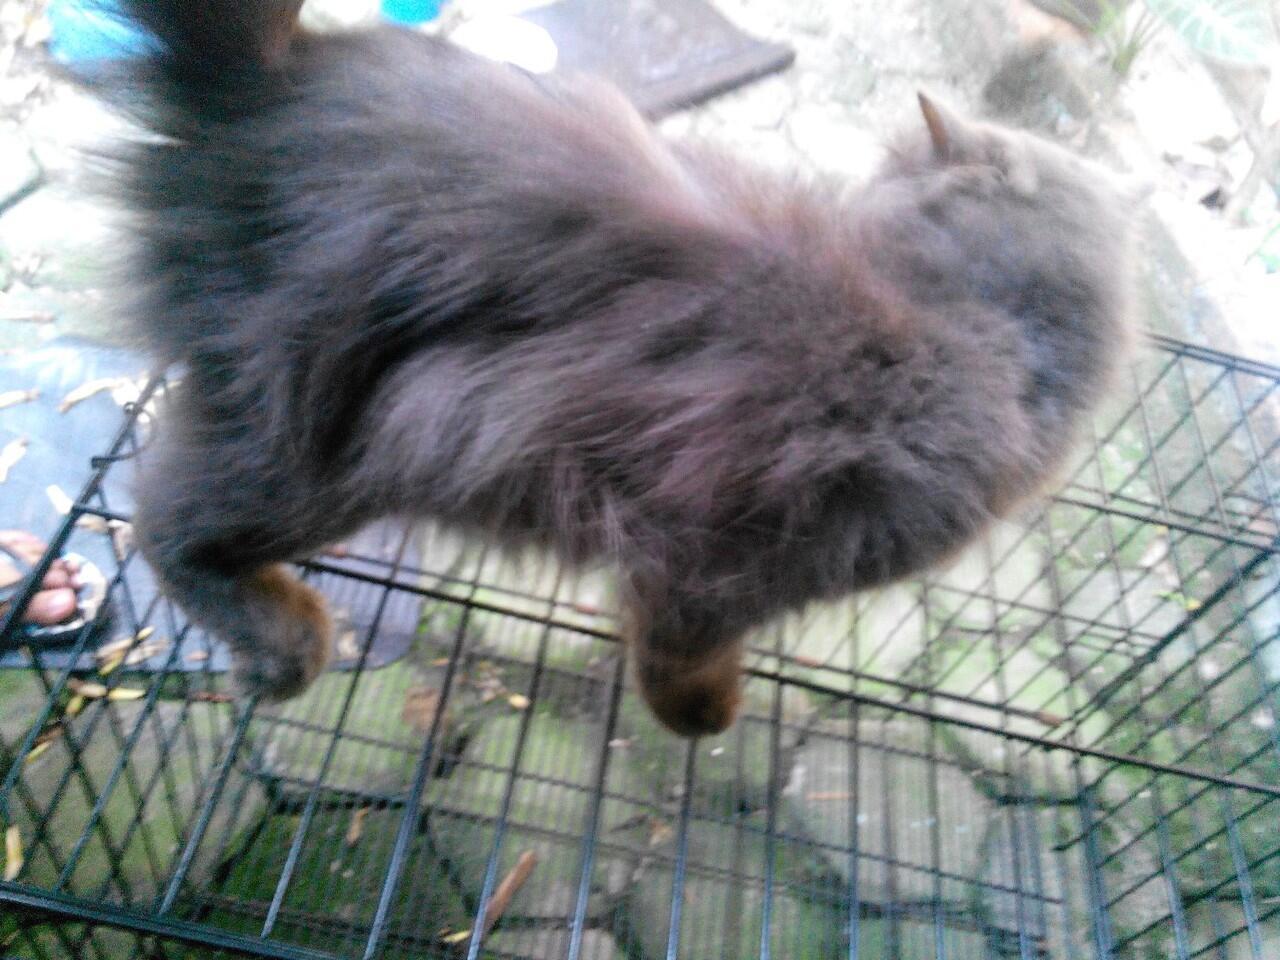 Jual Kucing Persia Betina Kesayangan Murah Terawat